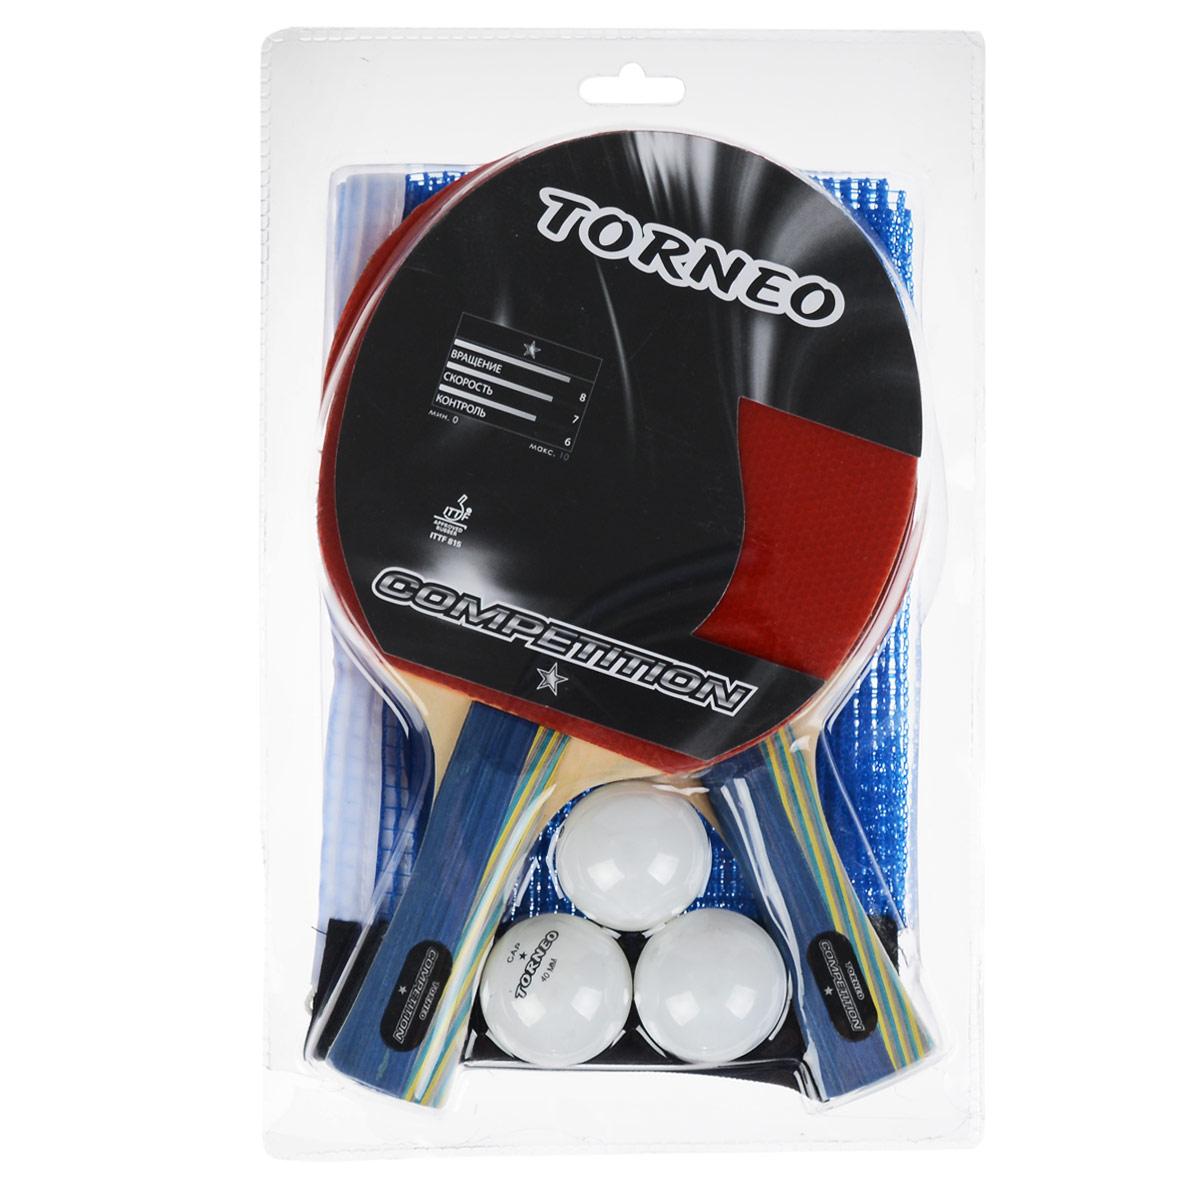 "TORNEO Набор для настольного тенниса ""Torneo"", 6 предметов. TI-BS1000"